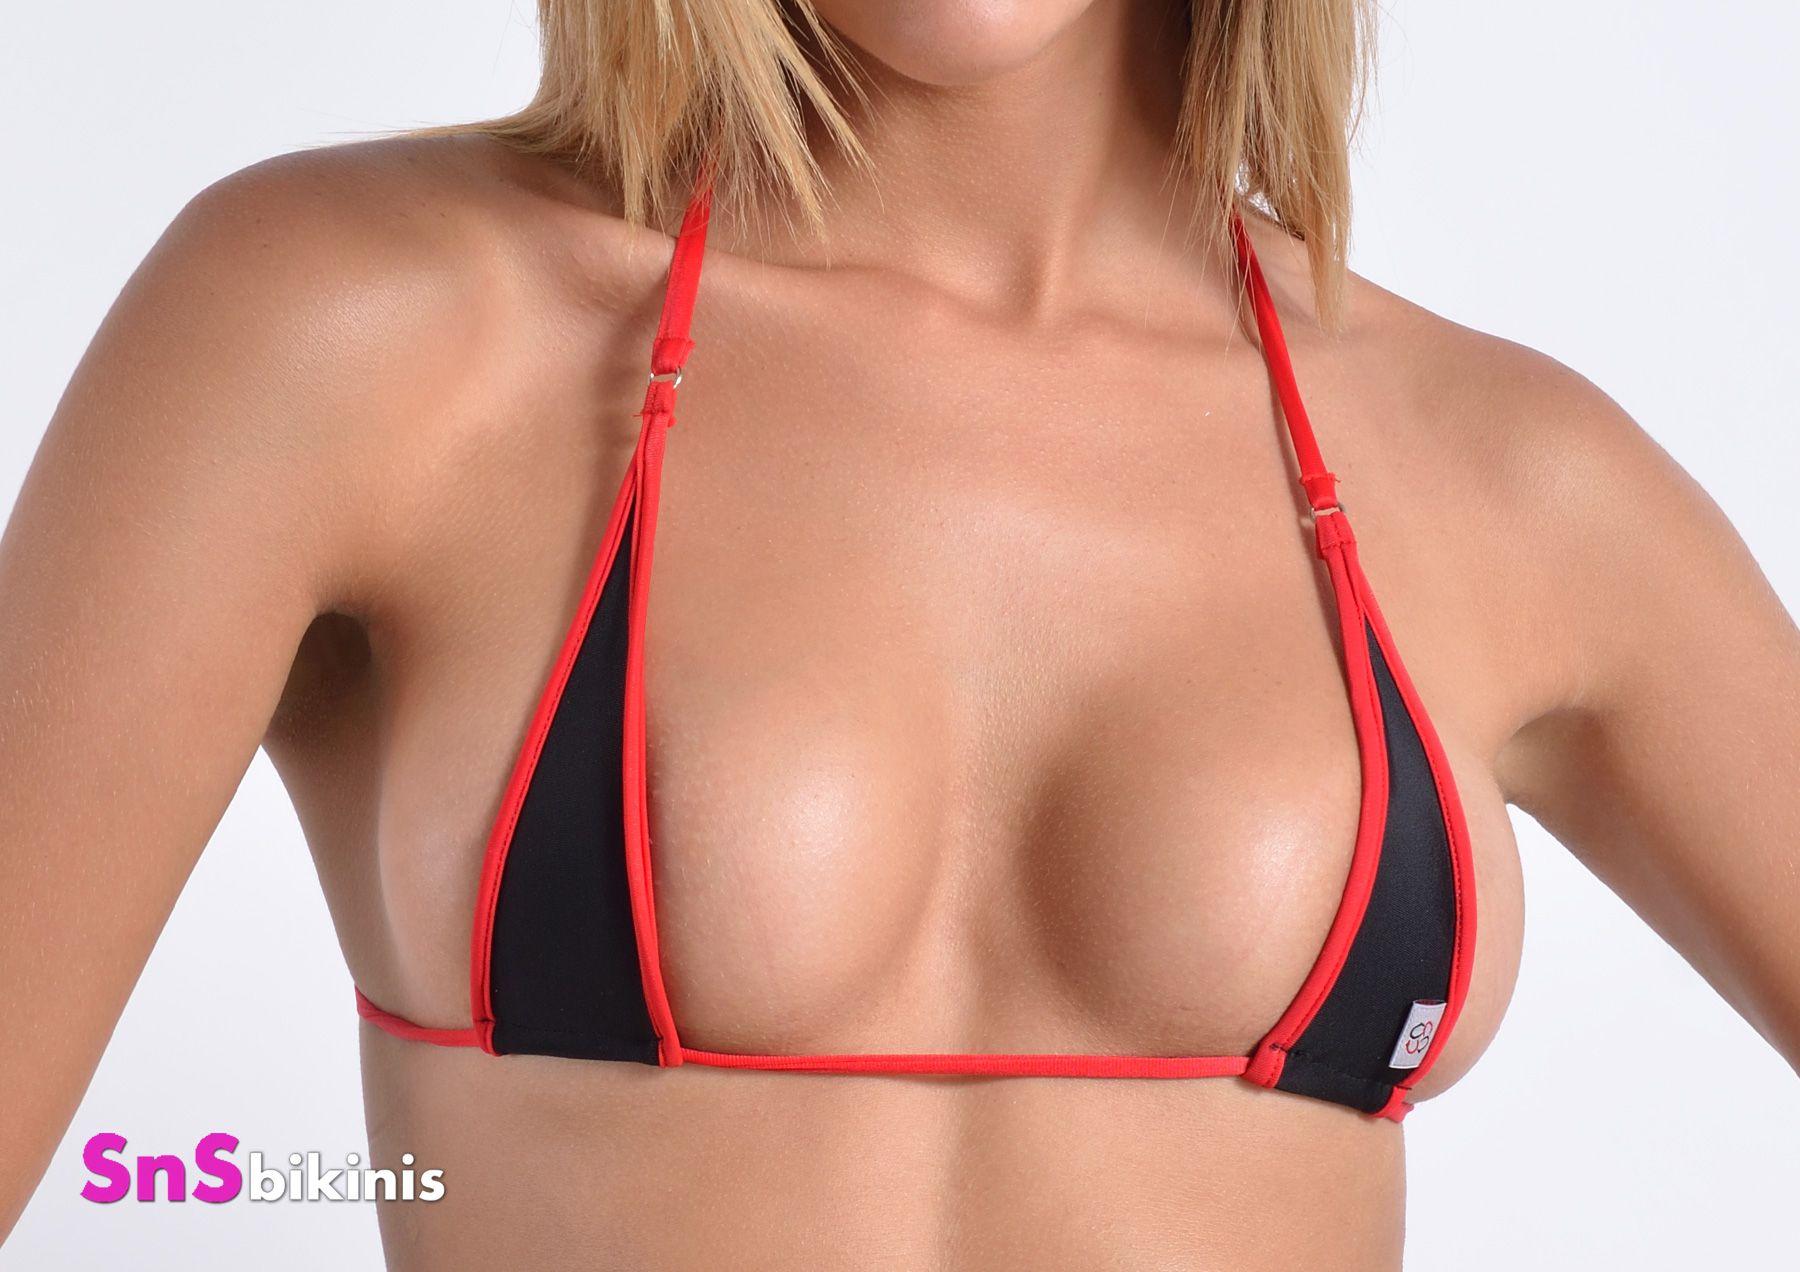 KISS ME Sexy Microbikini G-string bottom -  46.40   SnSbikinis ... 578c4fe560